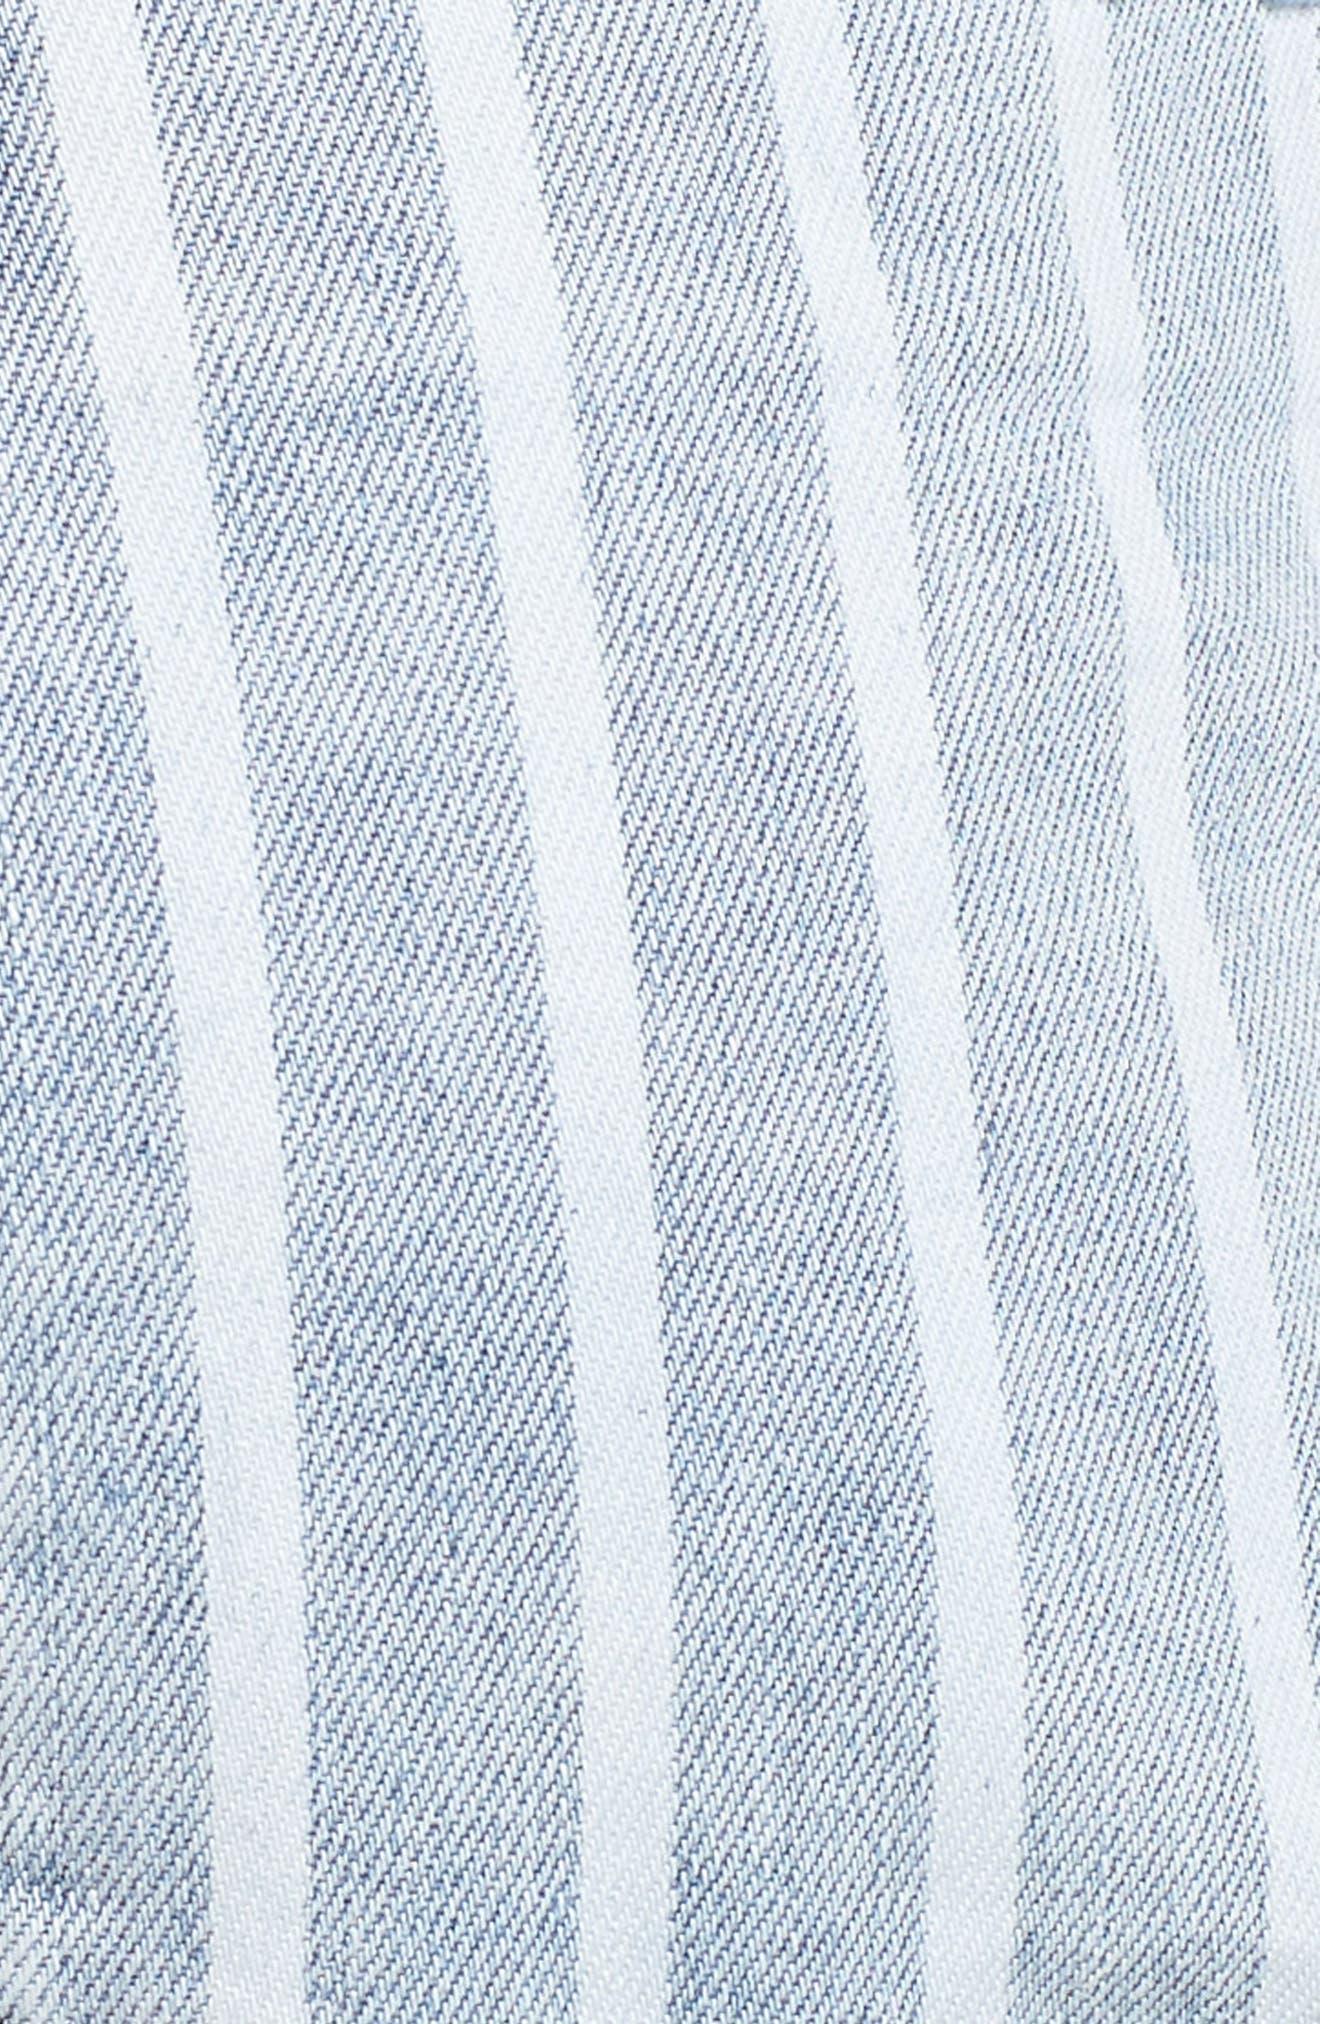 Bandit Stripe Denim Shorts,                             Alternate thumbnail 6, color,                             400